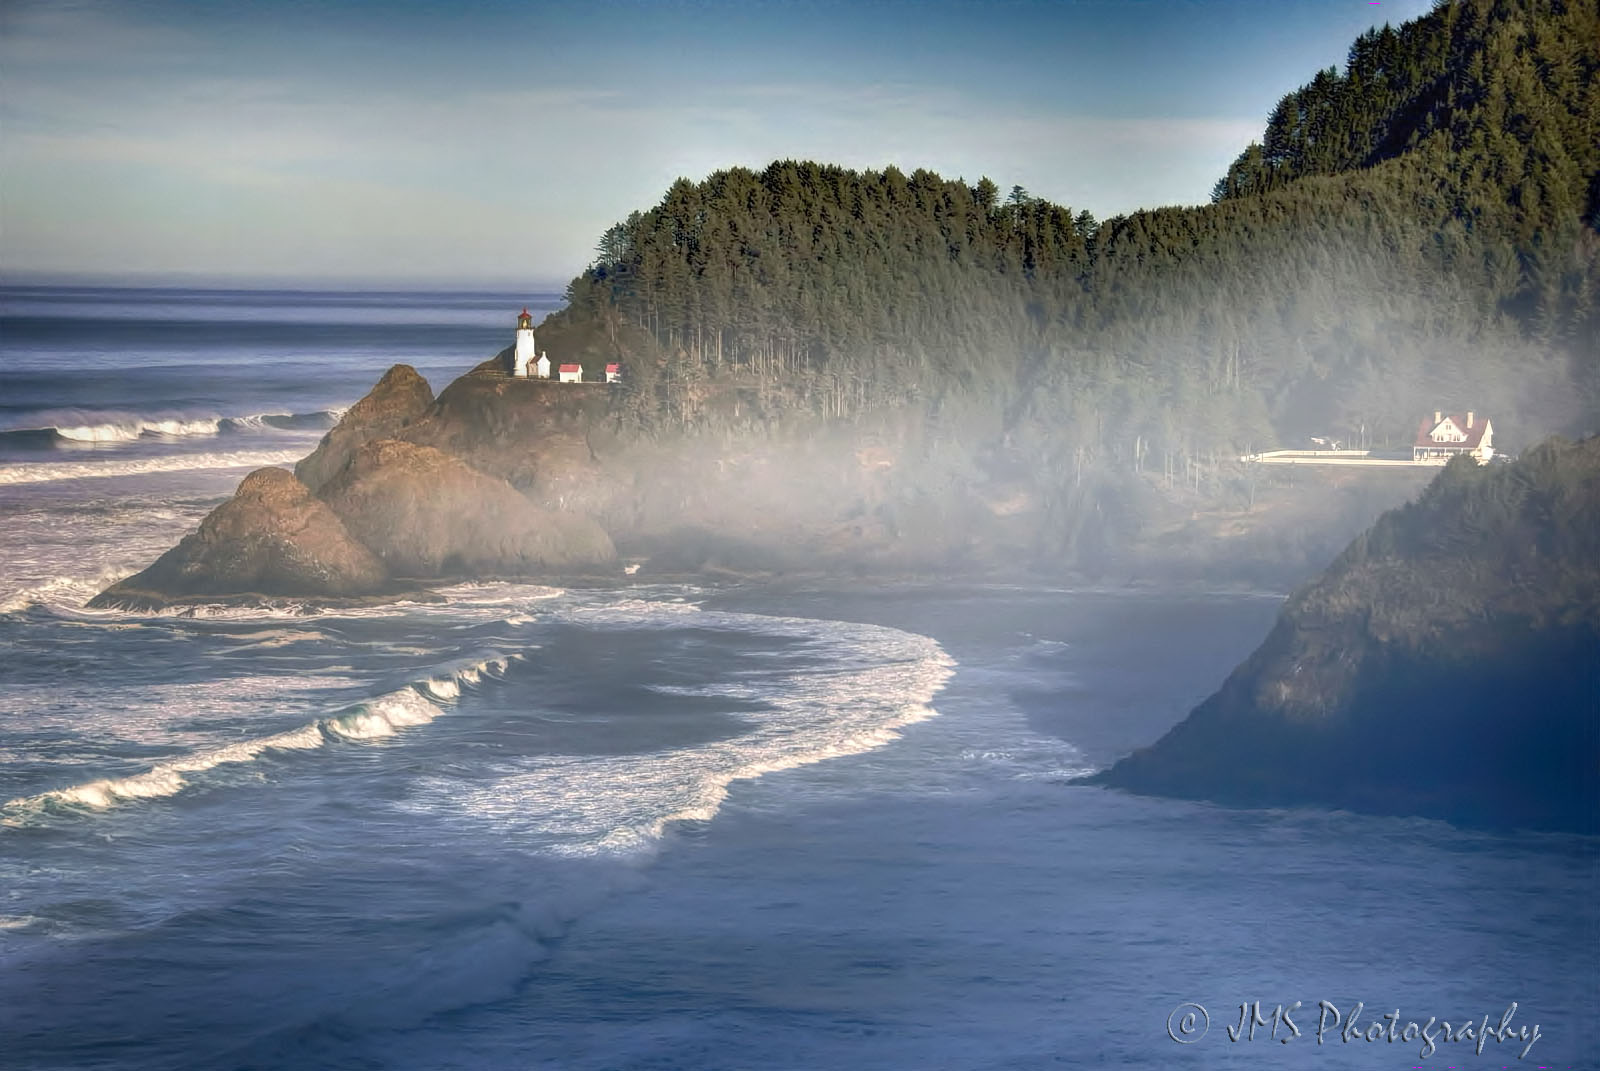 Cape Perpetua in the Mist